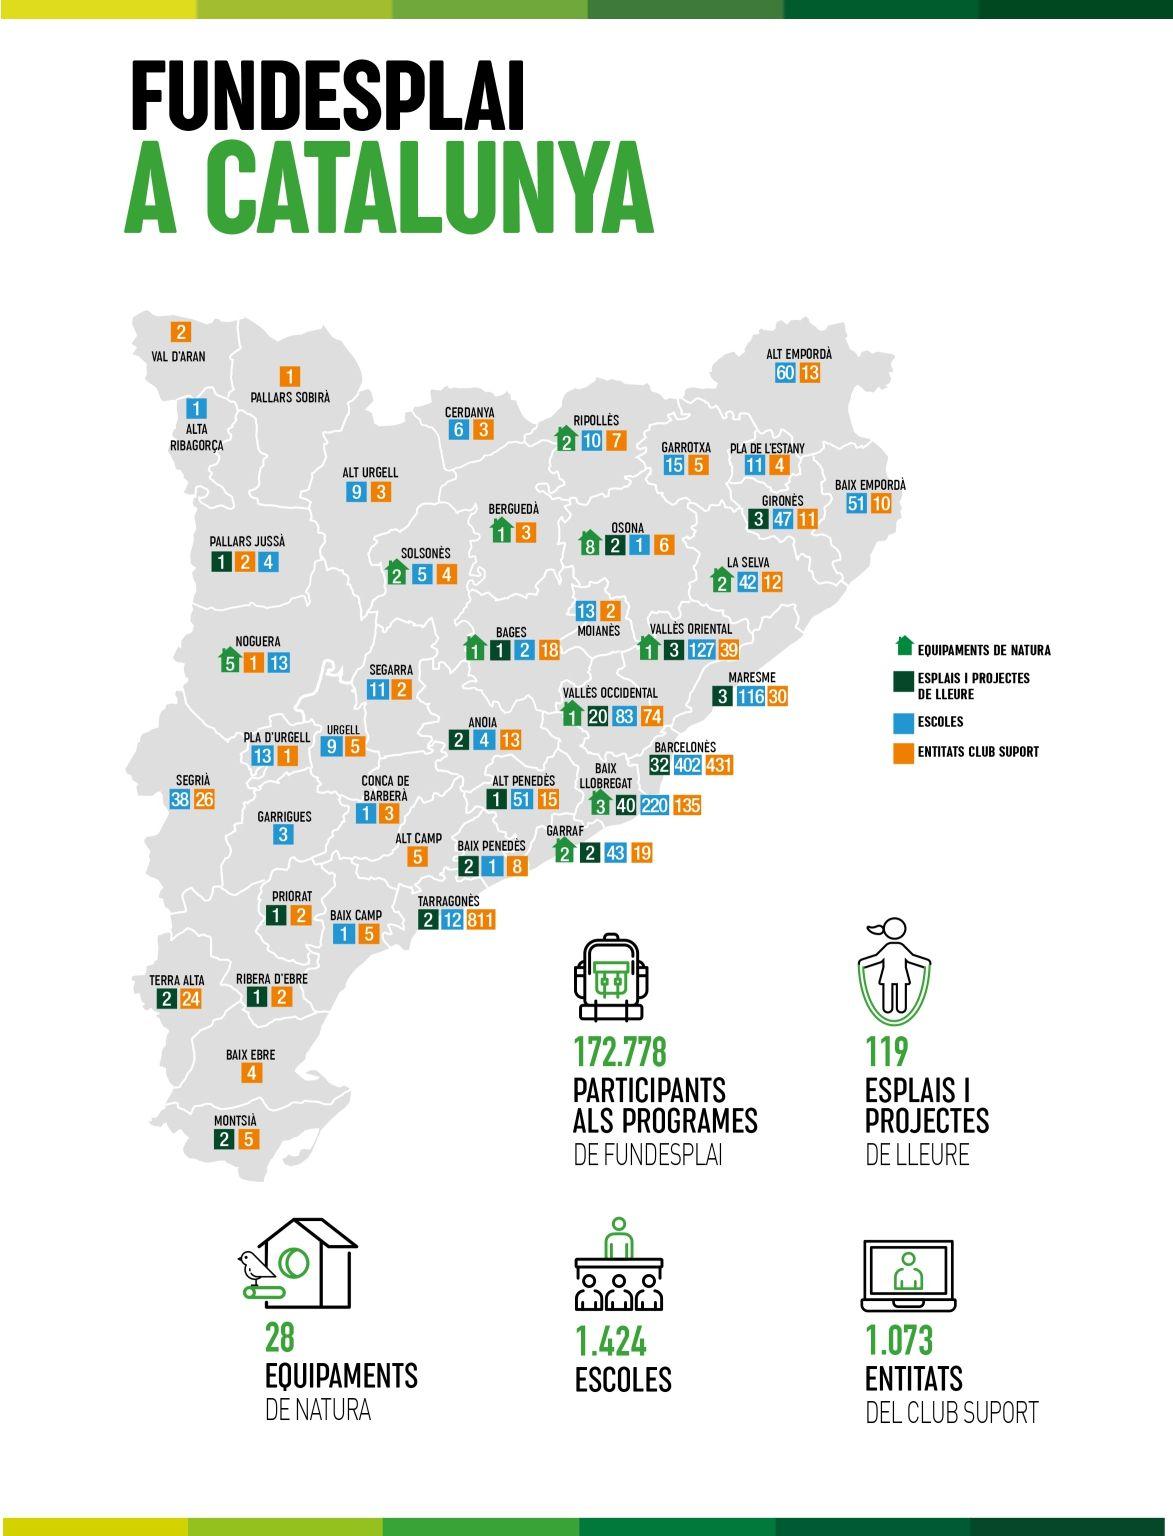 Fundesplai a Catalunya 20-21